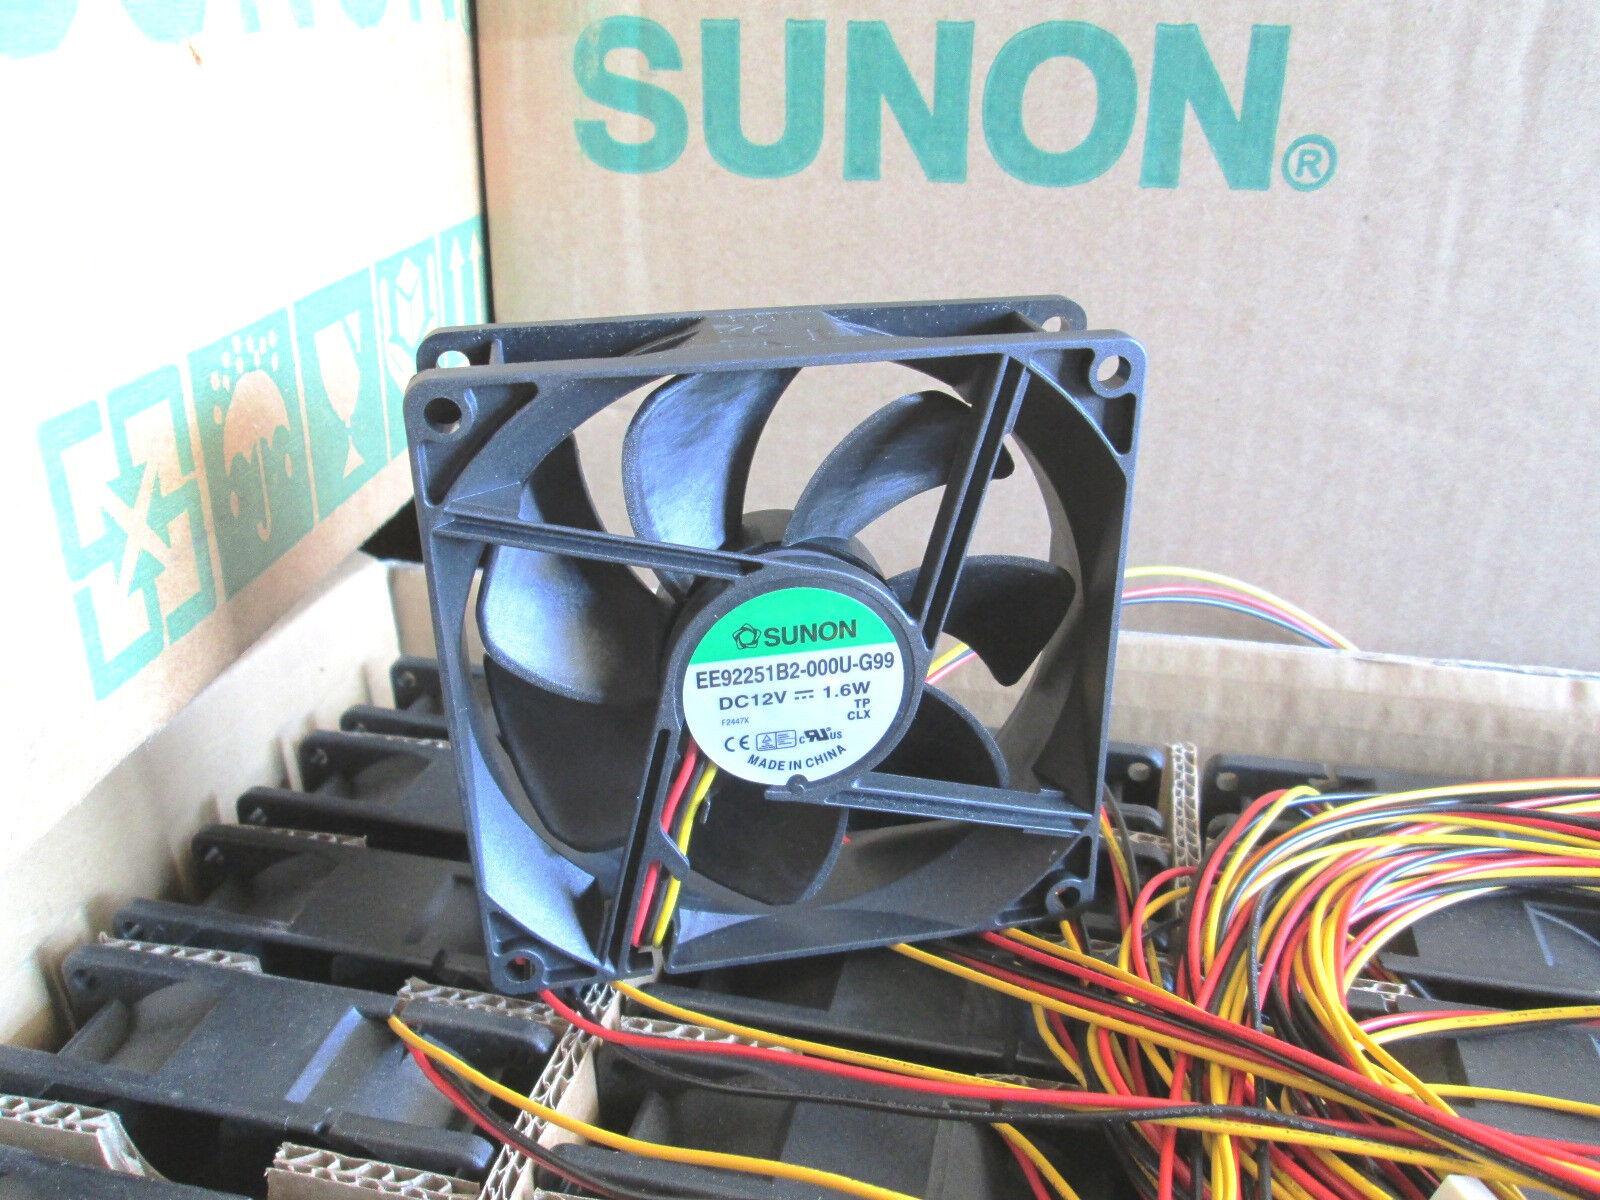 Sunon ME60151V2-000U-G99 Hi-speed 4700RPM 21.9CFM 60mmx15mm-3pin Tach Sensor